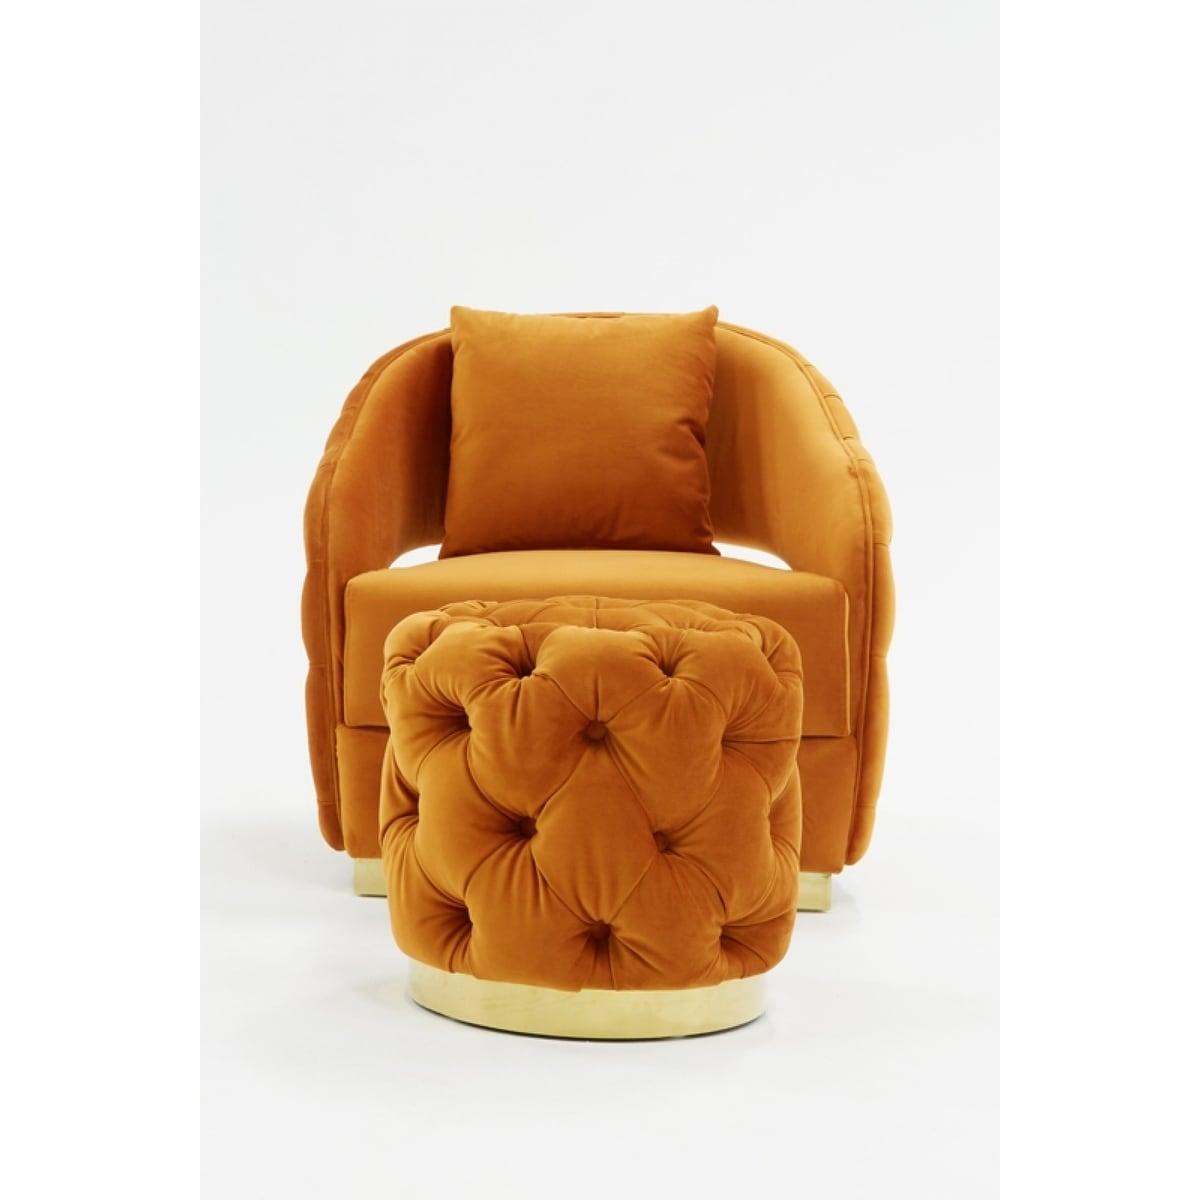 Miraculous Divani Casa Duarte Modern Orange Velvet Accent Chair Andrewgaddart Wooden Chair Designs For Living Room Andrewgaddartcom